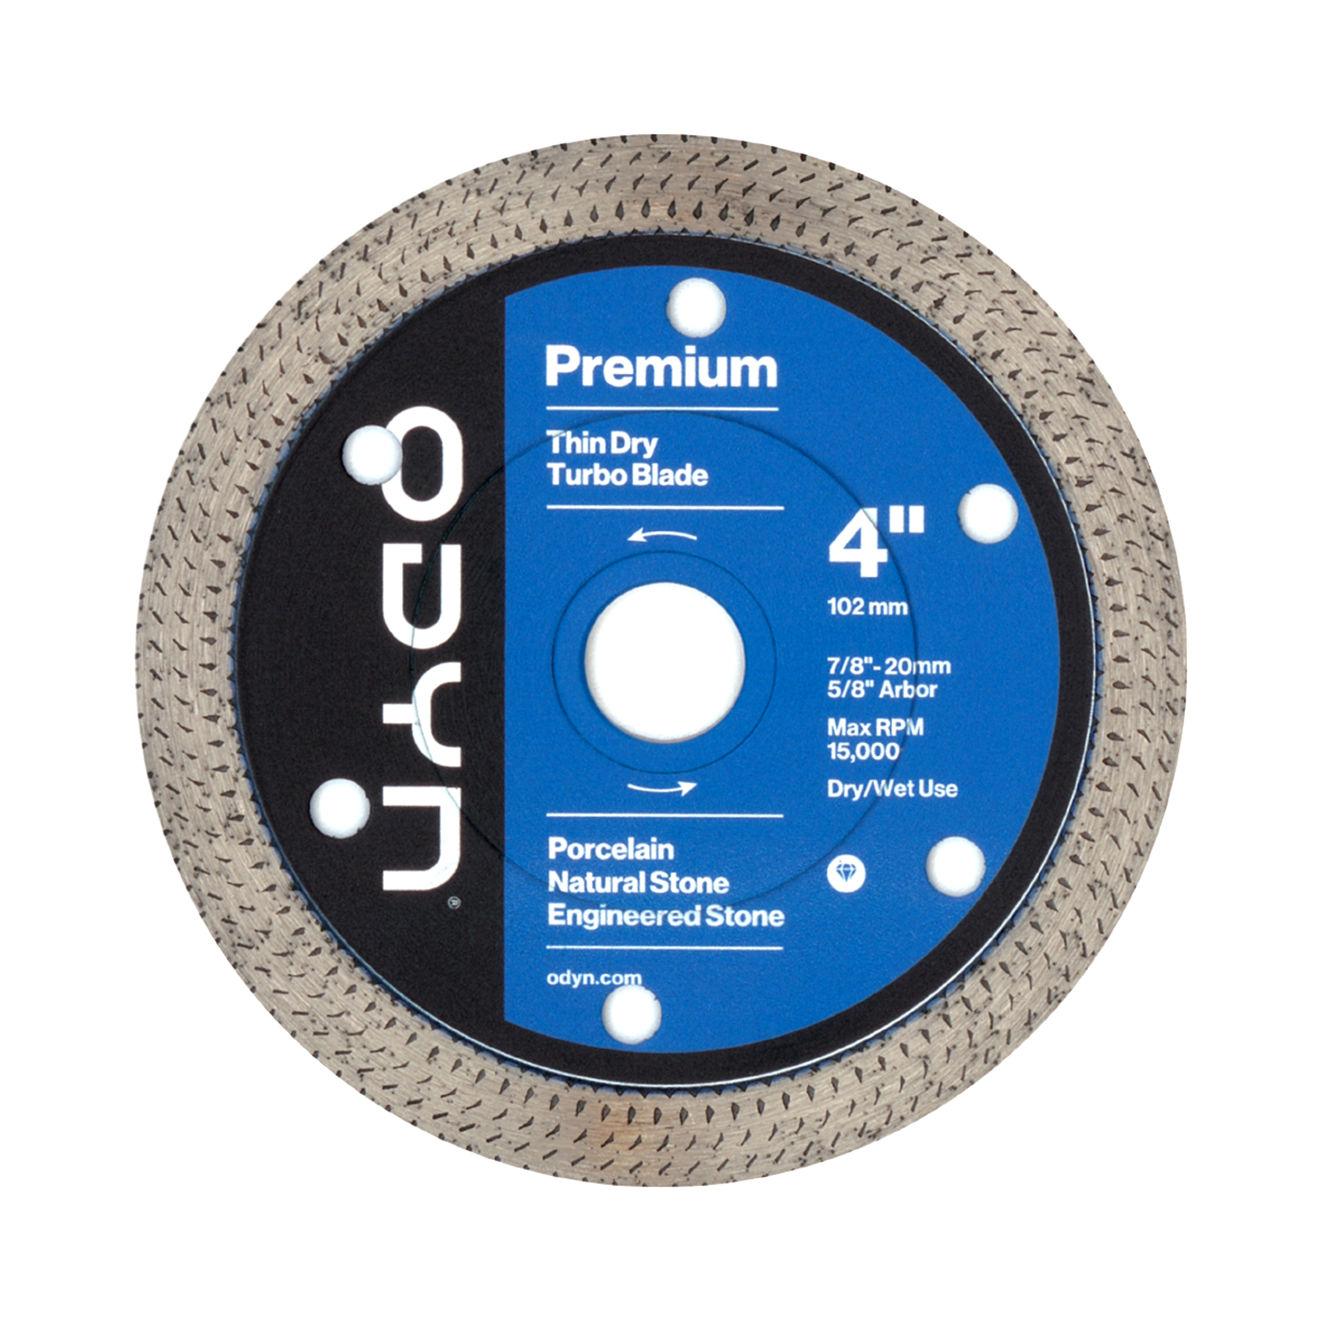 Odyn 4 in. Premium Thin Dry Turbo Blade